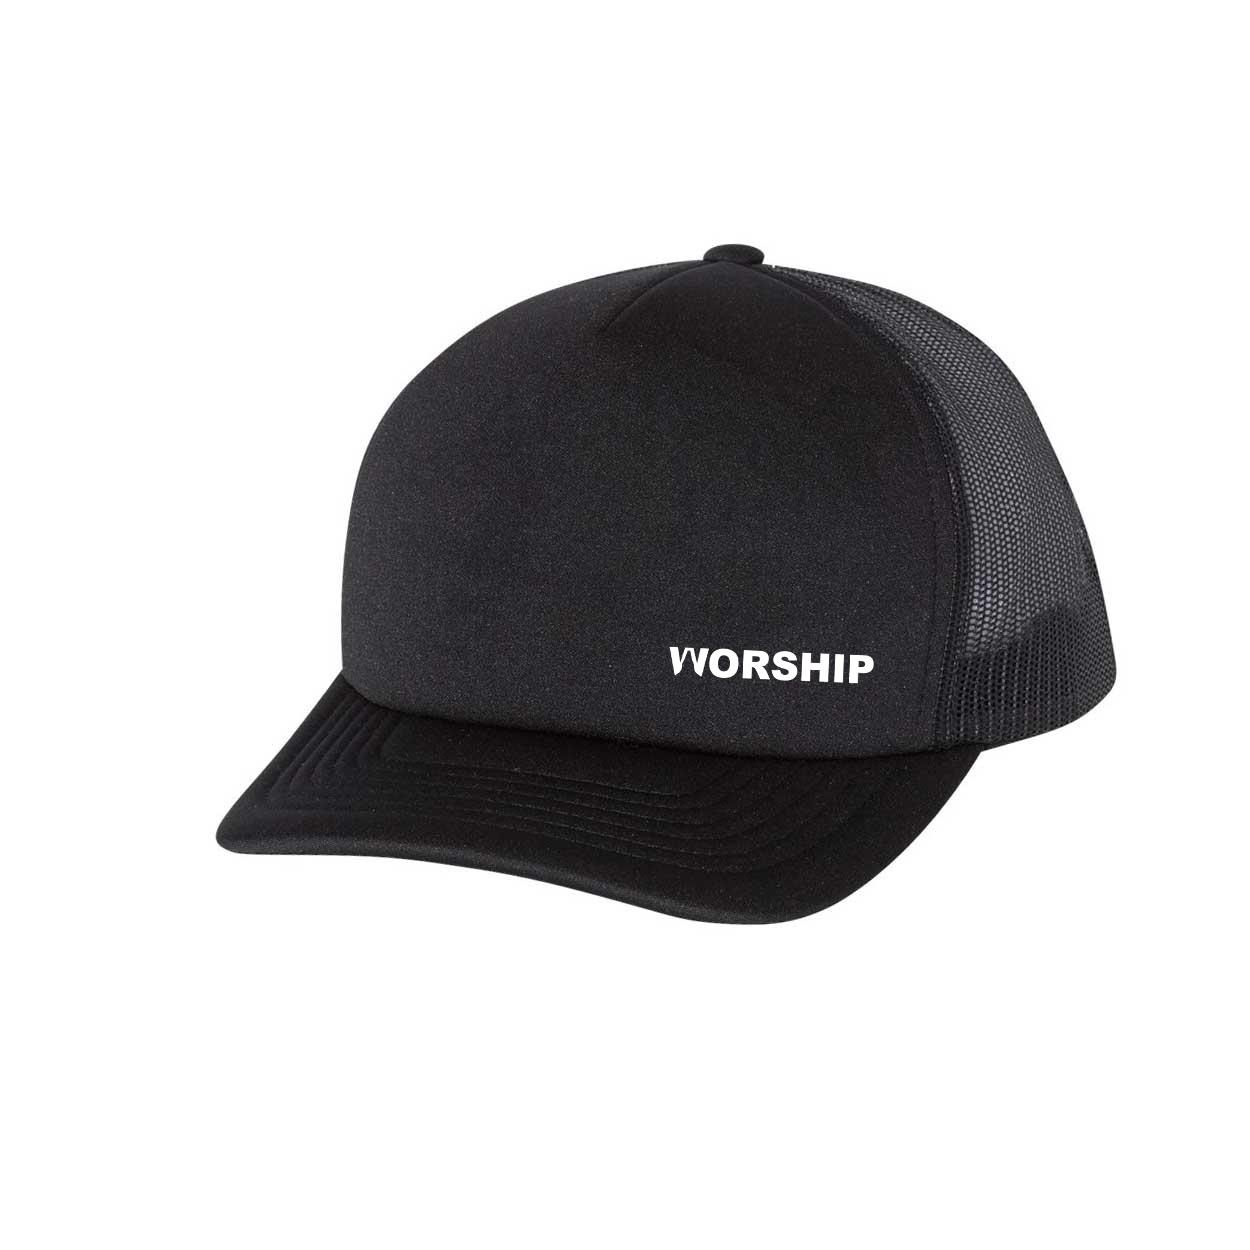 Worship Pray Logo Night Out Premium Foam Trucker Snapback Hat Black (White Logo)